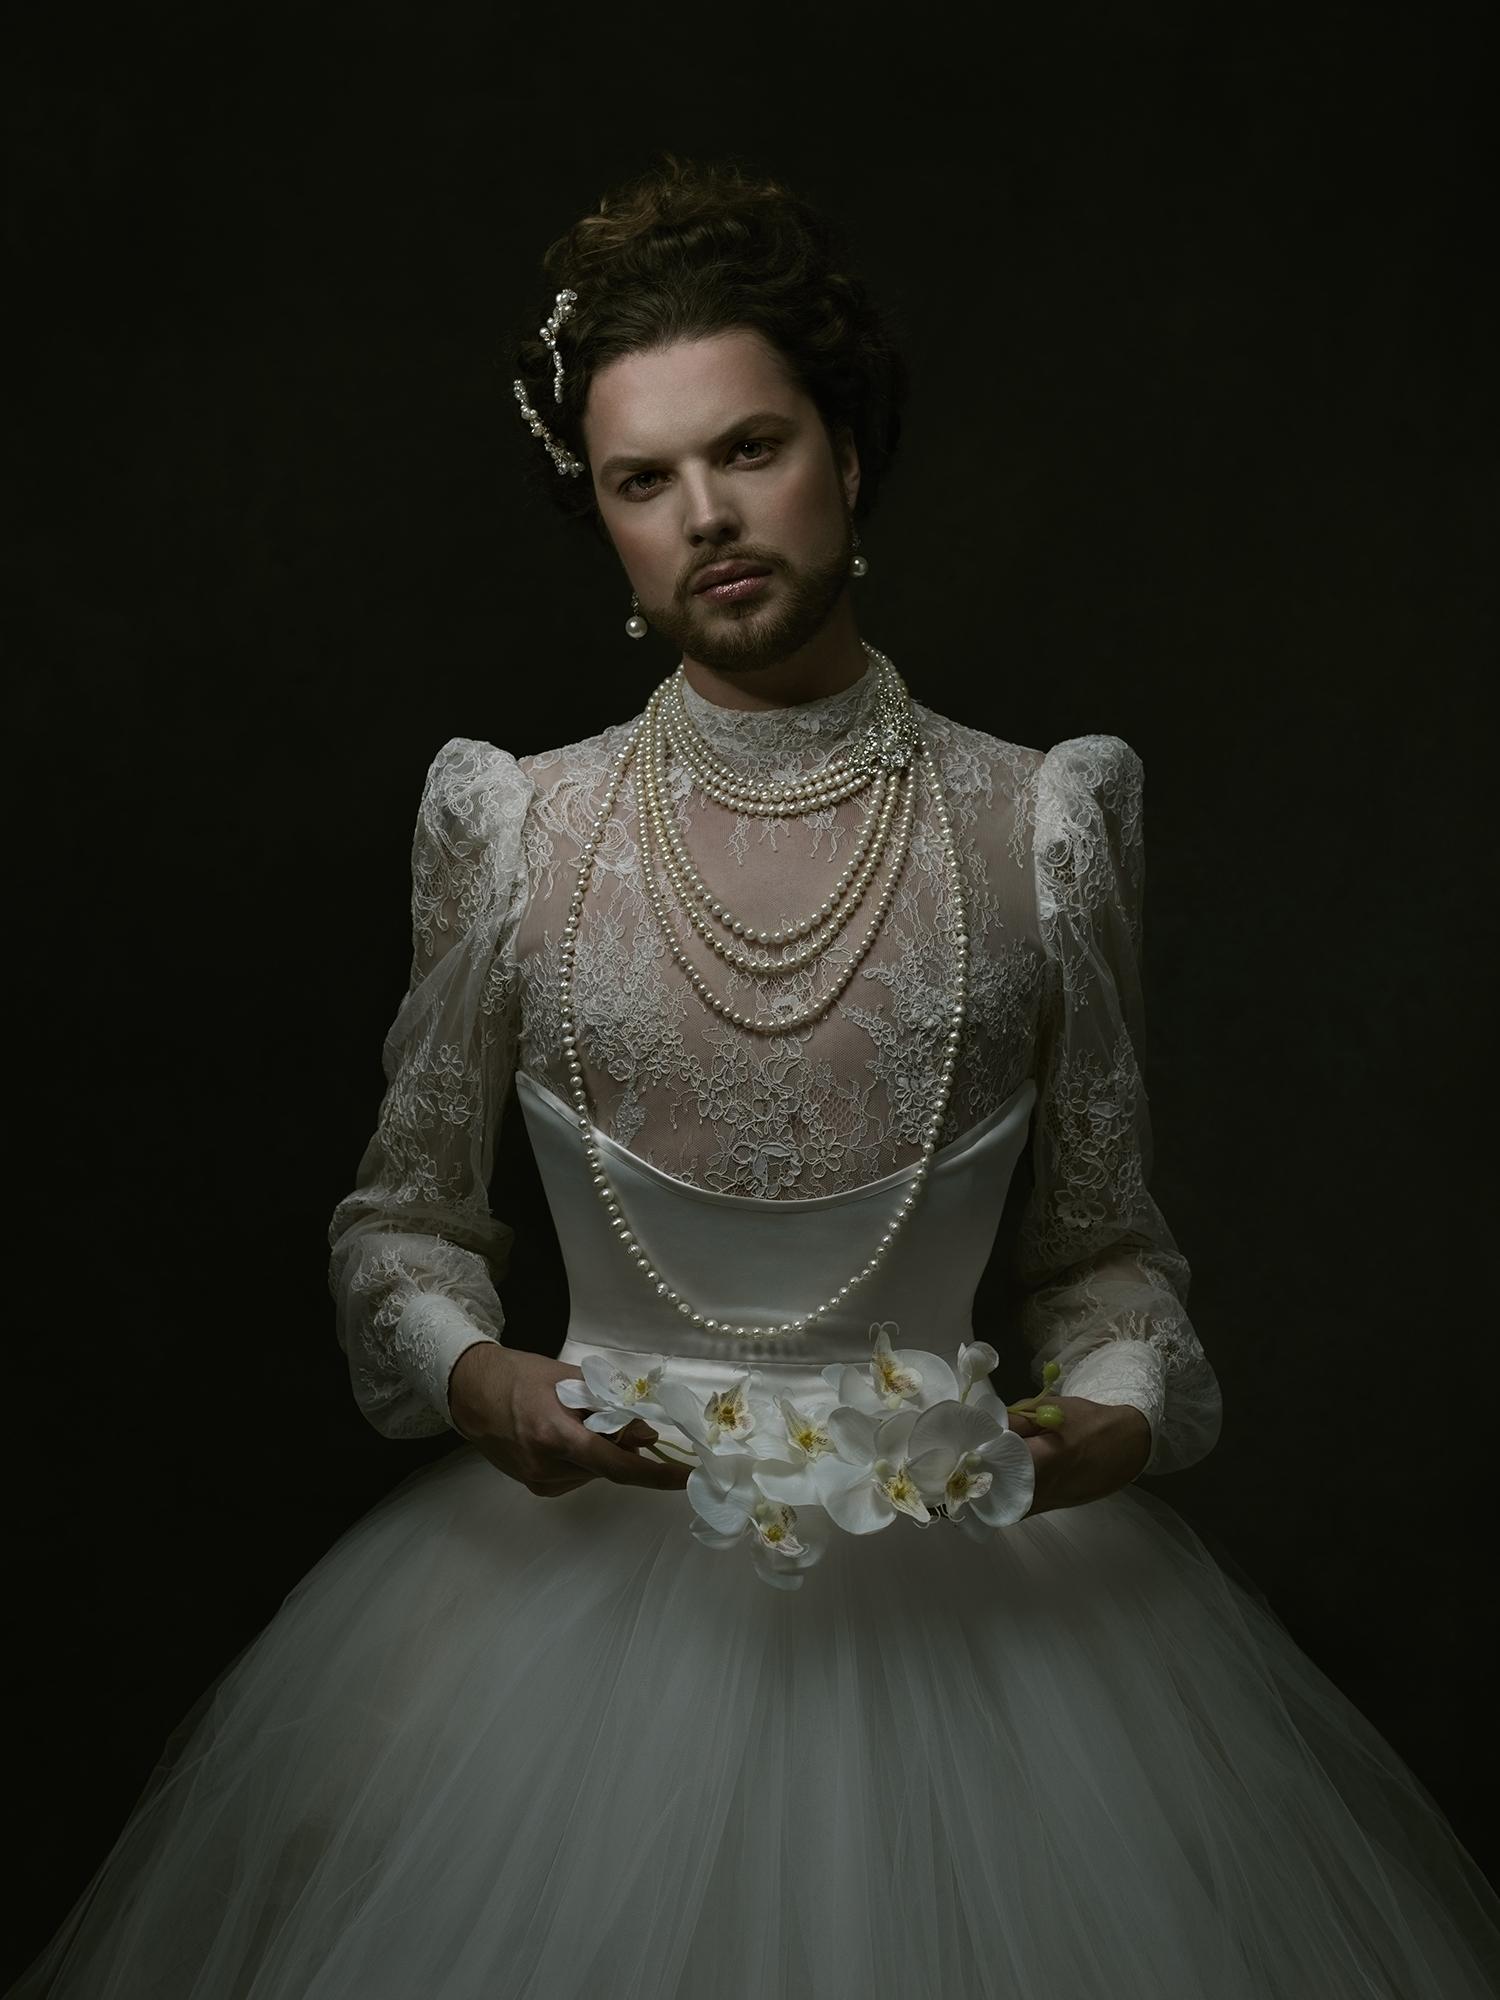 The Bride III